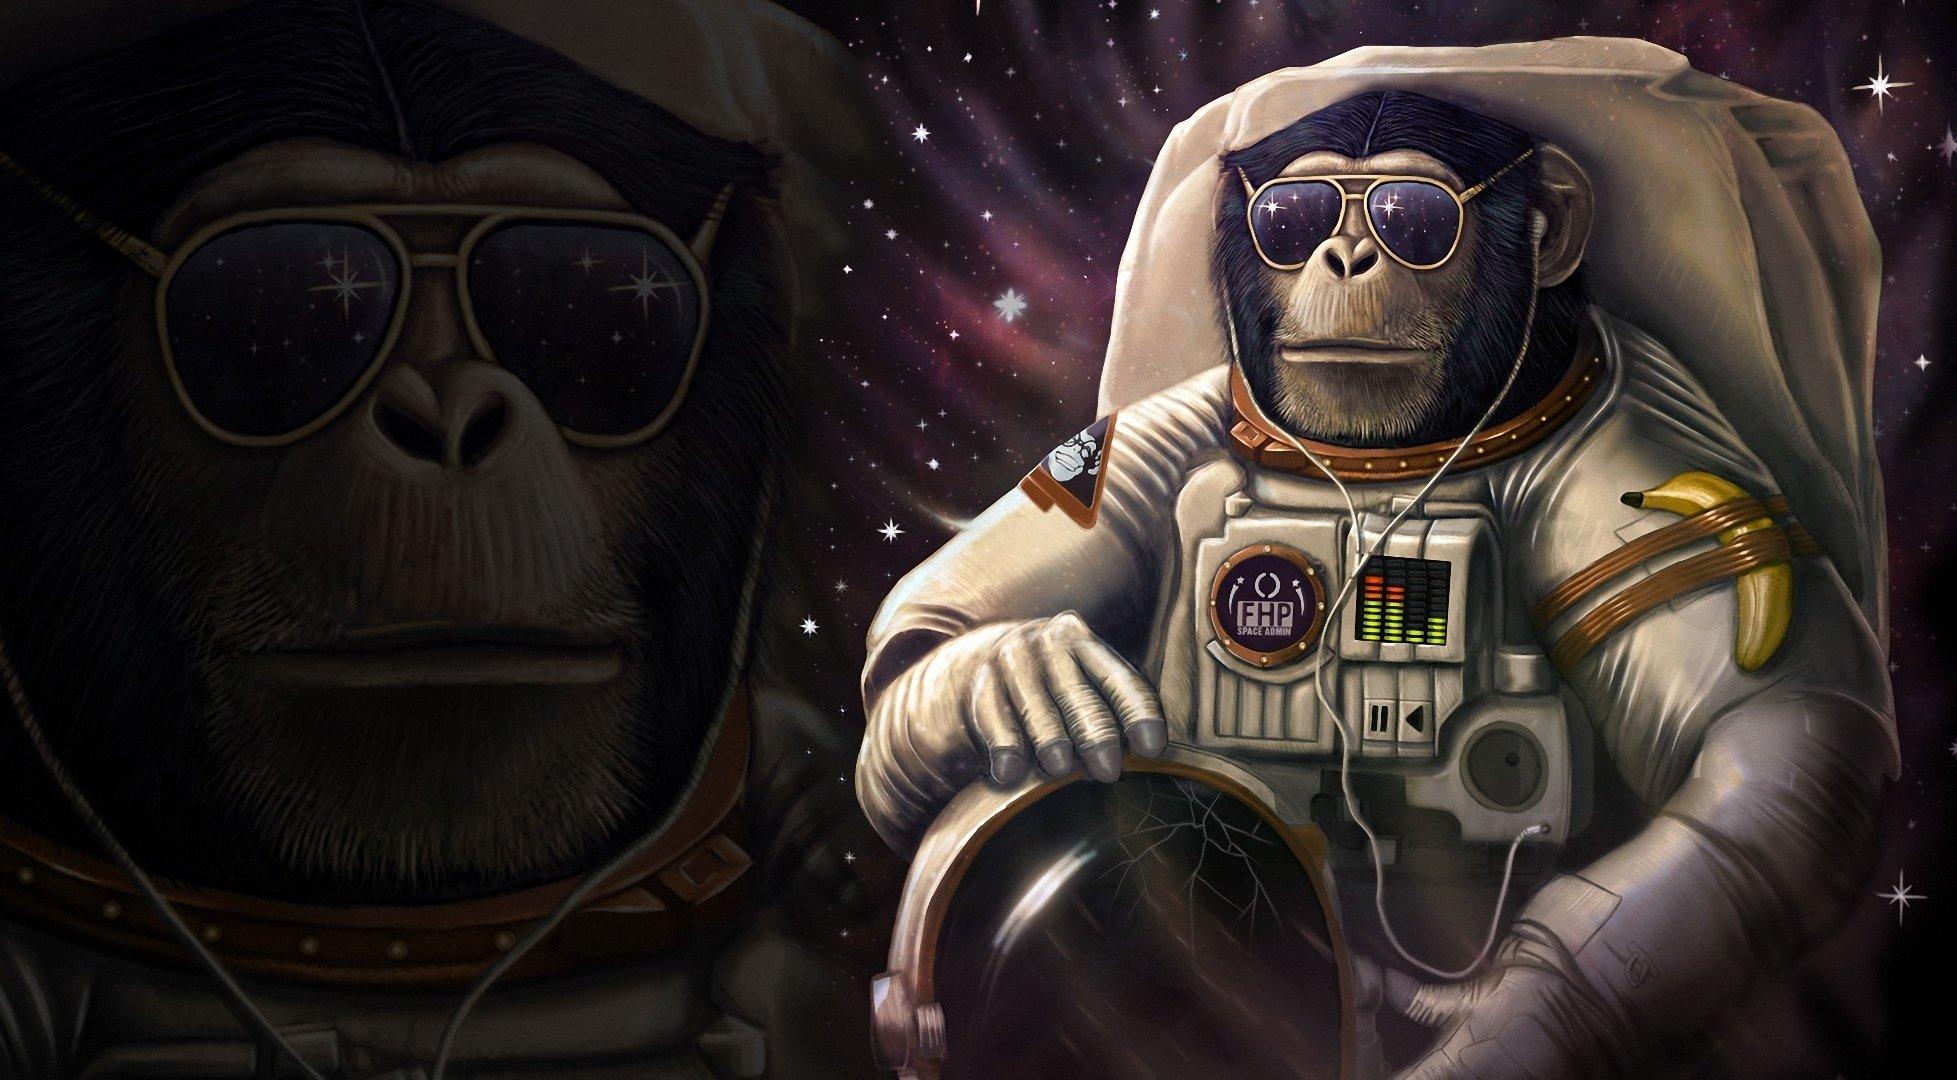 Monkey astronaut Glasses Helmet Fantasy Animals Space 1957x1080